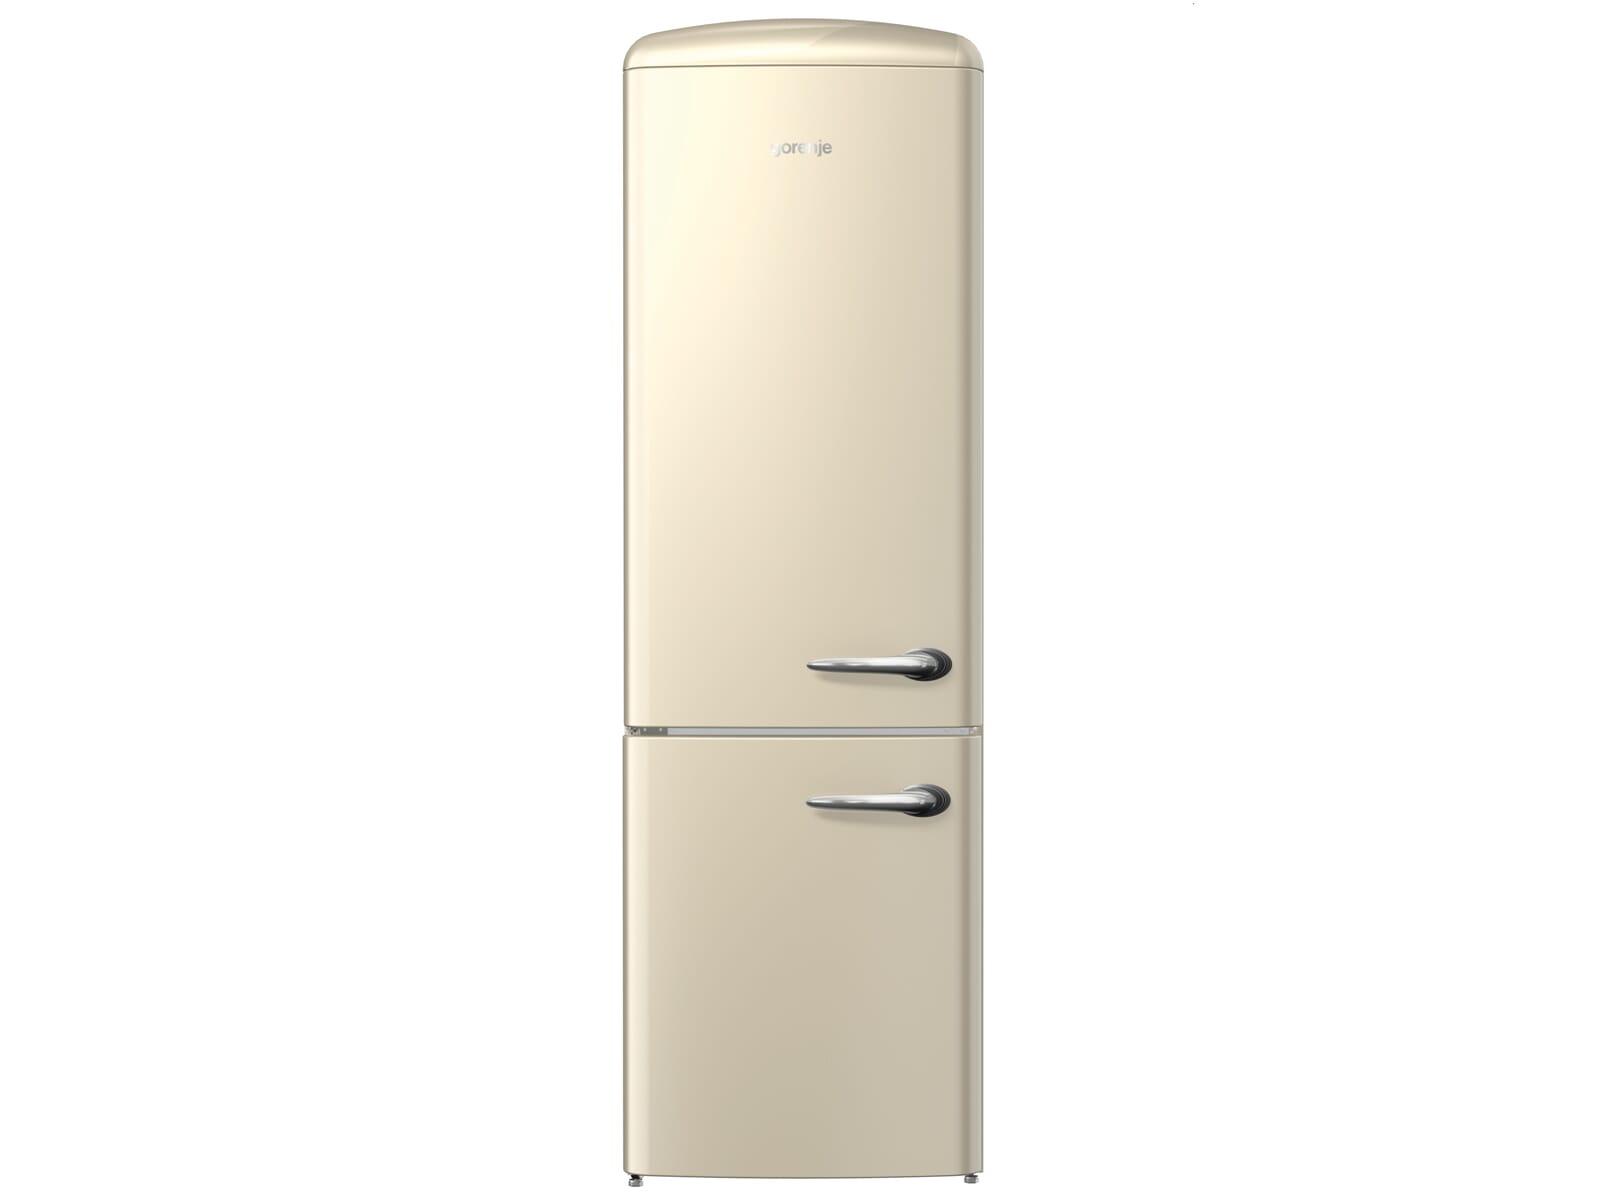 Gorenje Kühlschrank Herkunft : Gorenje kühlschrank raspberry pink kühlschrank pink ebay